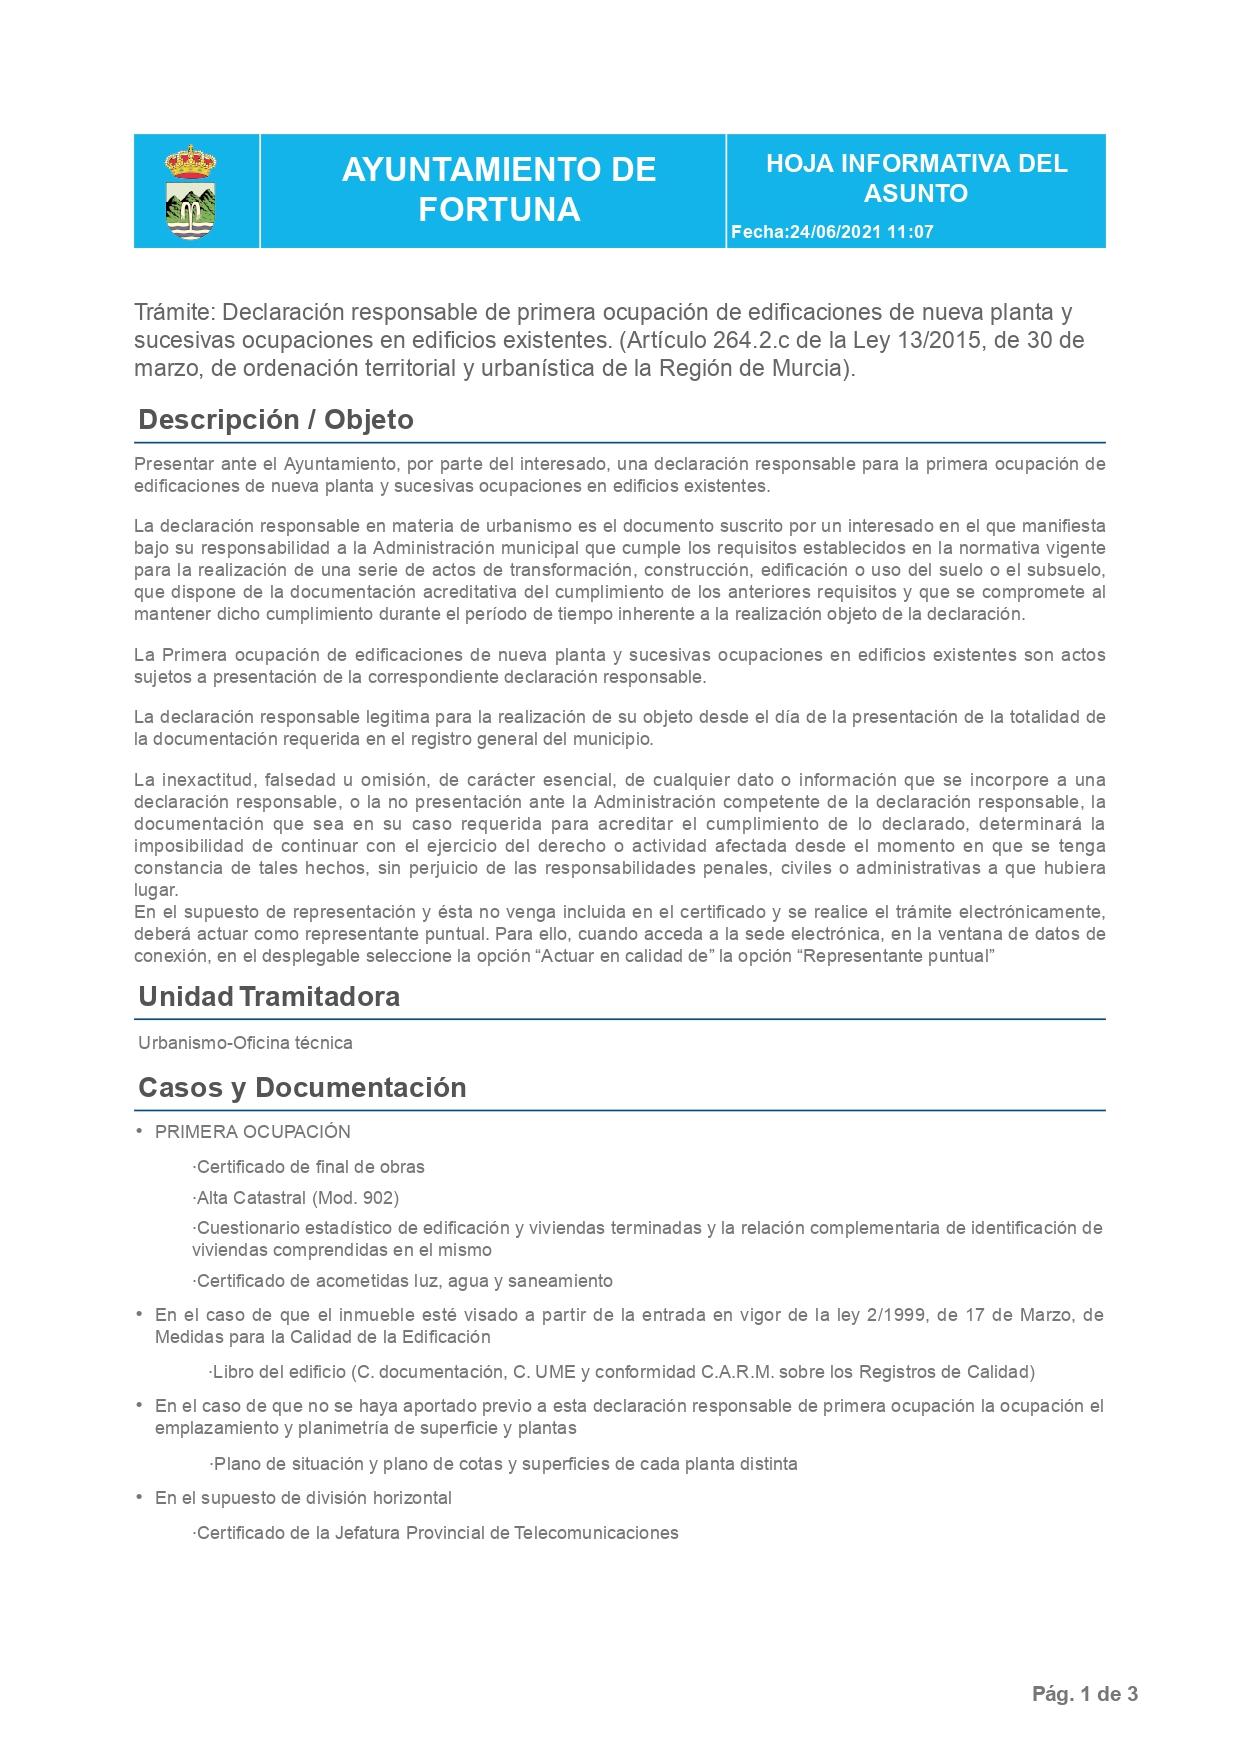 Declaración Responsable Segunda Ocupación o Cédula de Habitabilidad en Fortuna